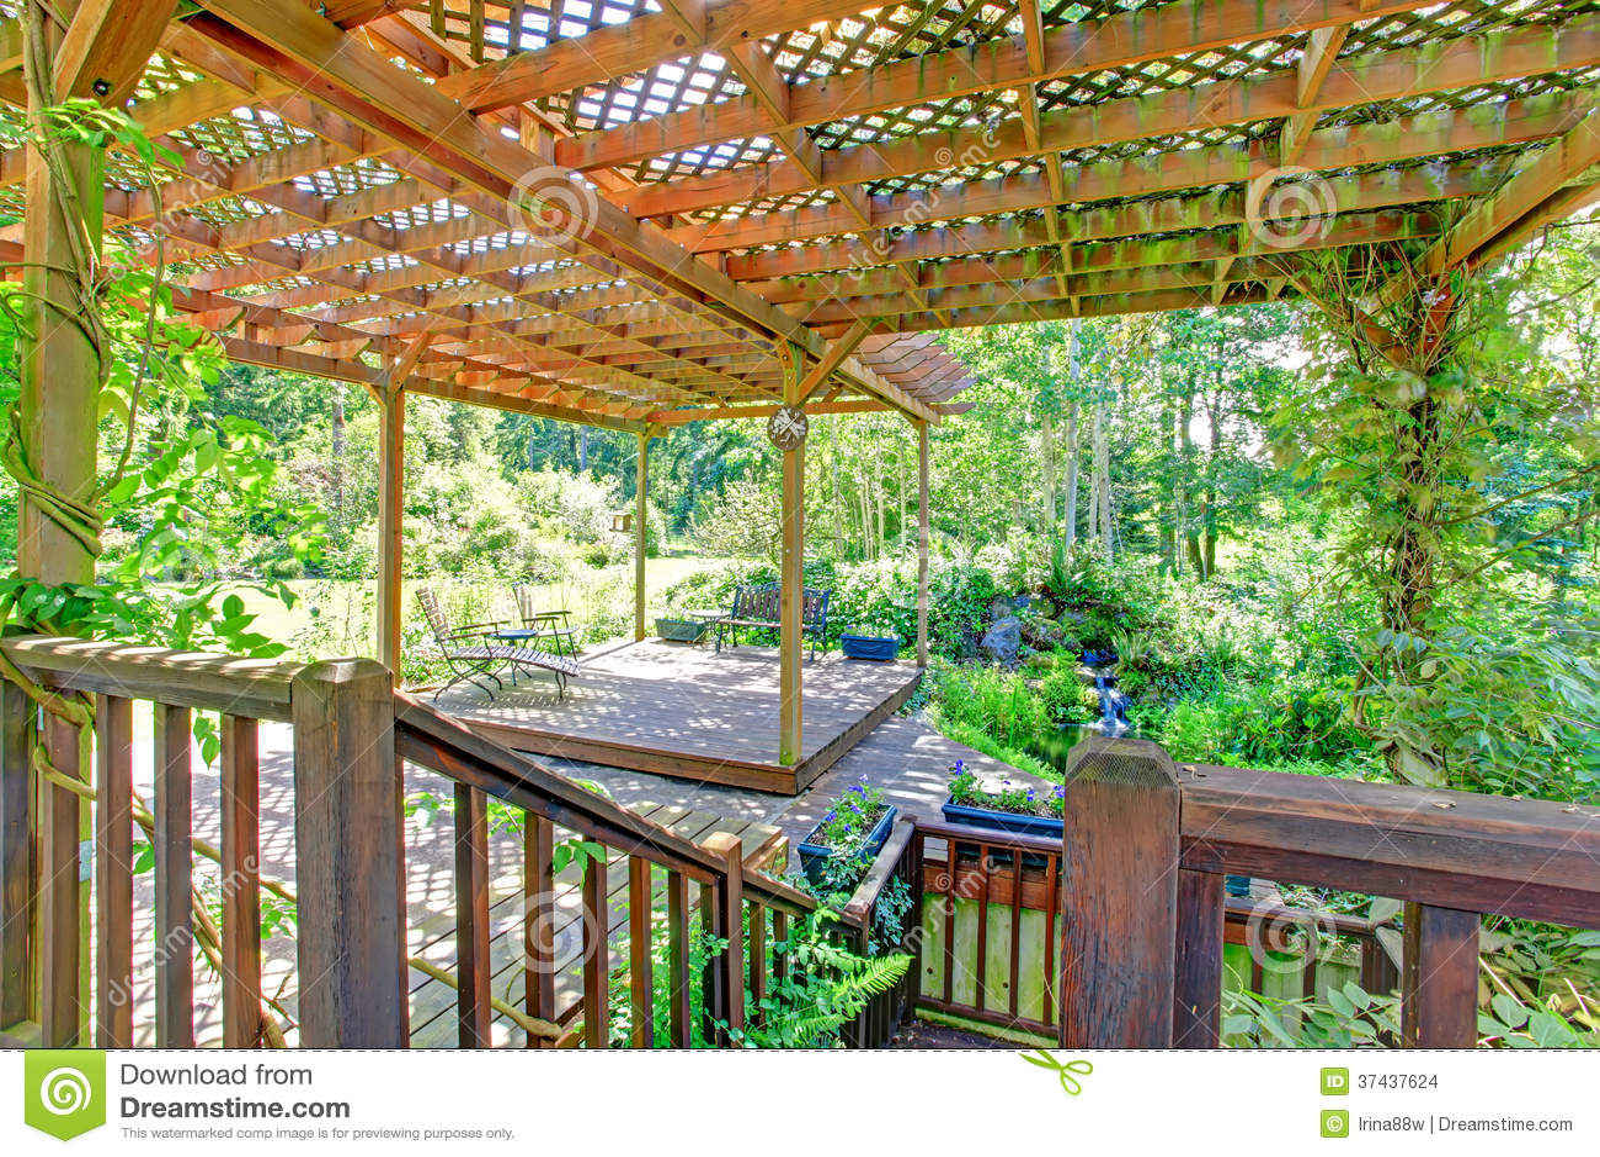 Hinterhofbauernhofplattform mit befestigter offener pergola